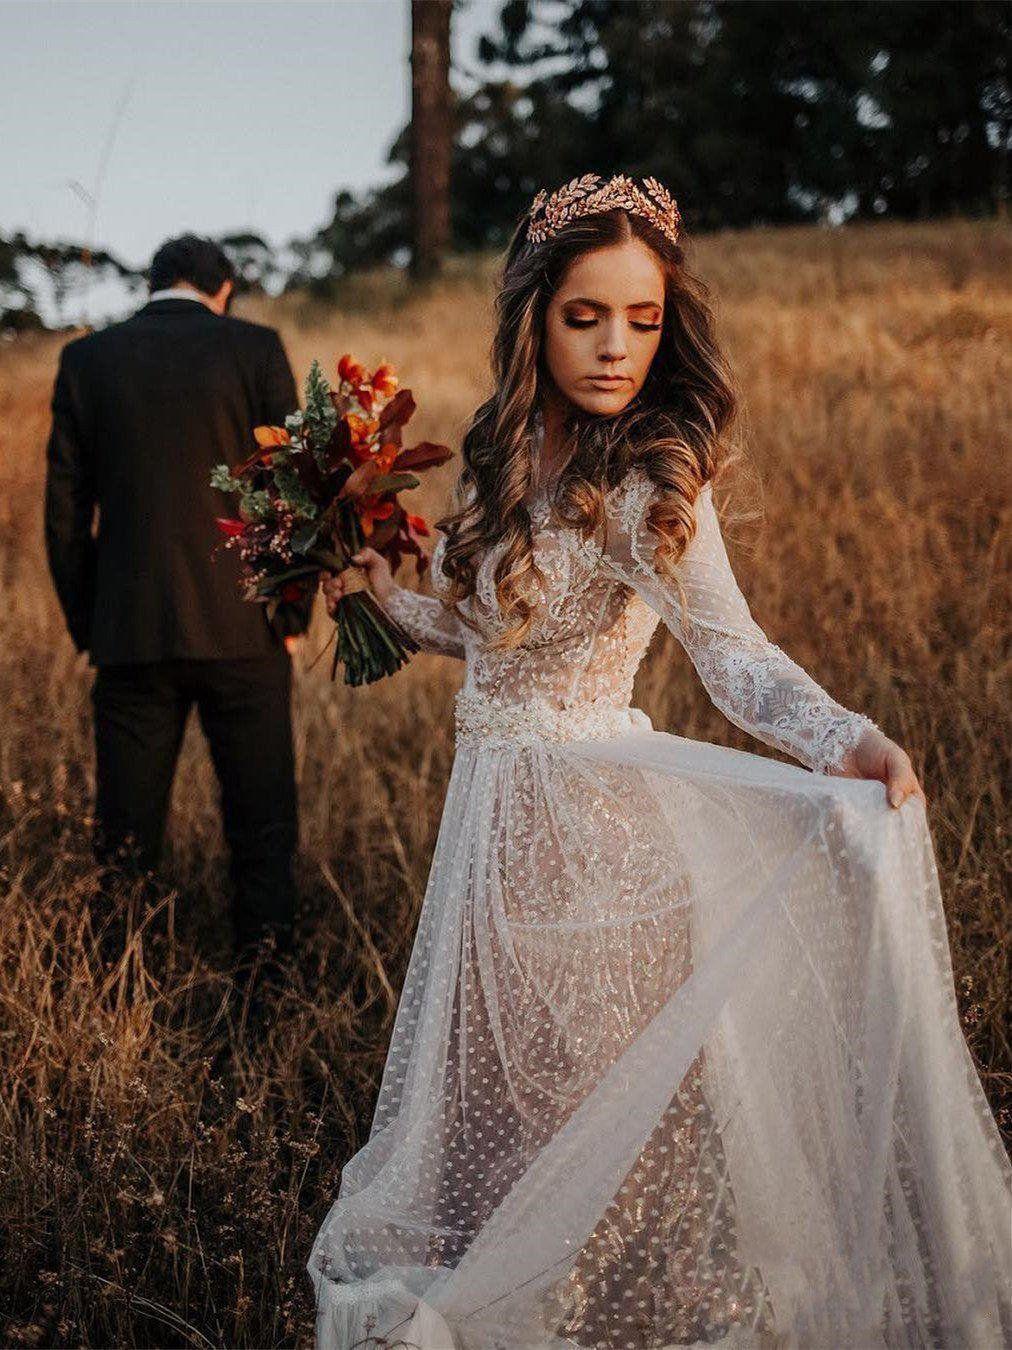 28+ Polka dot wedding dress with sleeves ideas in 2021